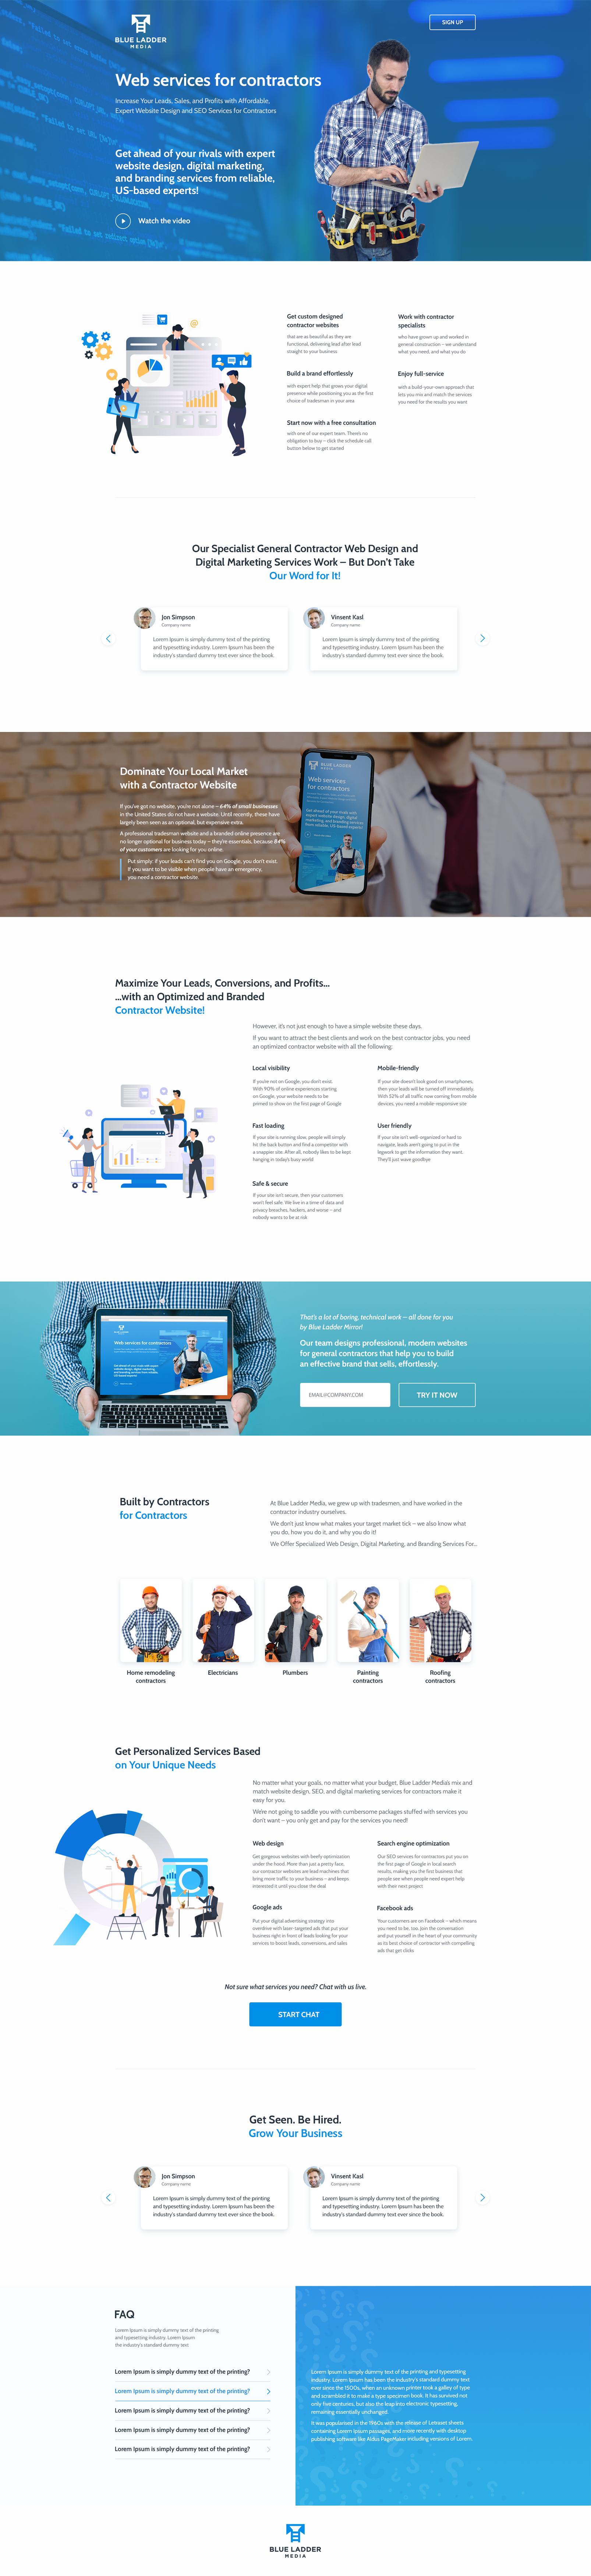 Лендинг / Blue Ladder - маркетинговое агенство